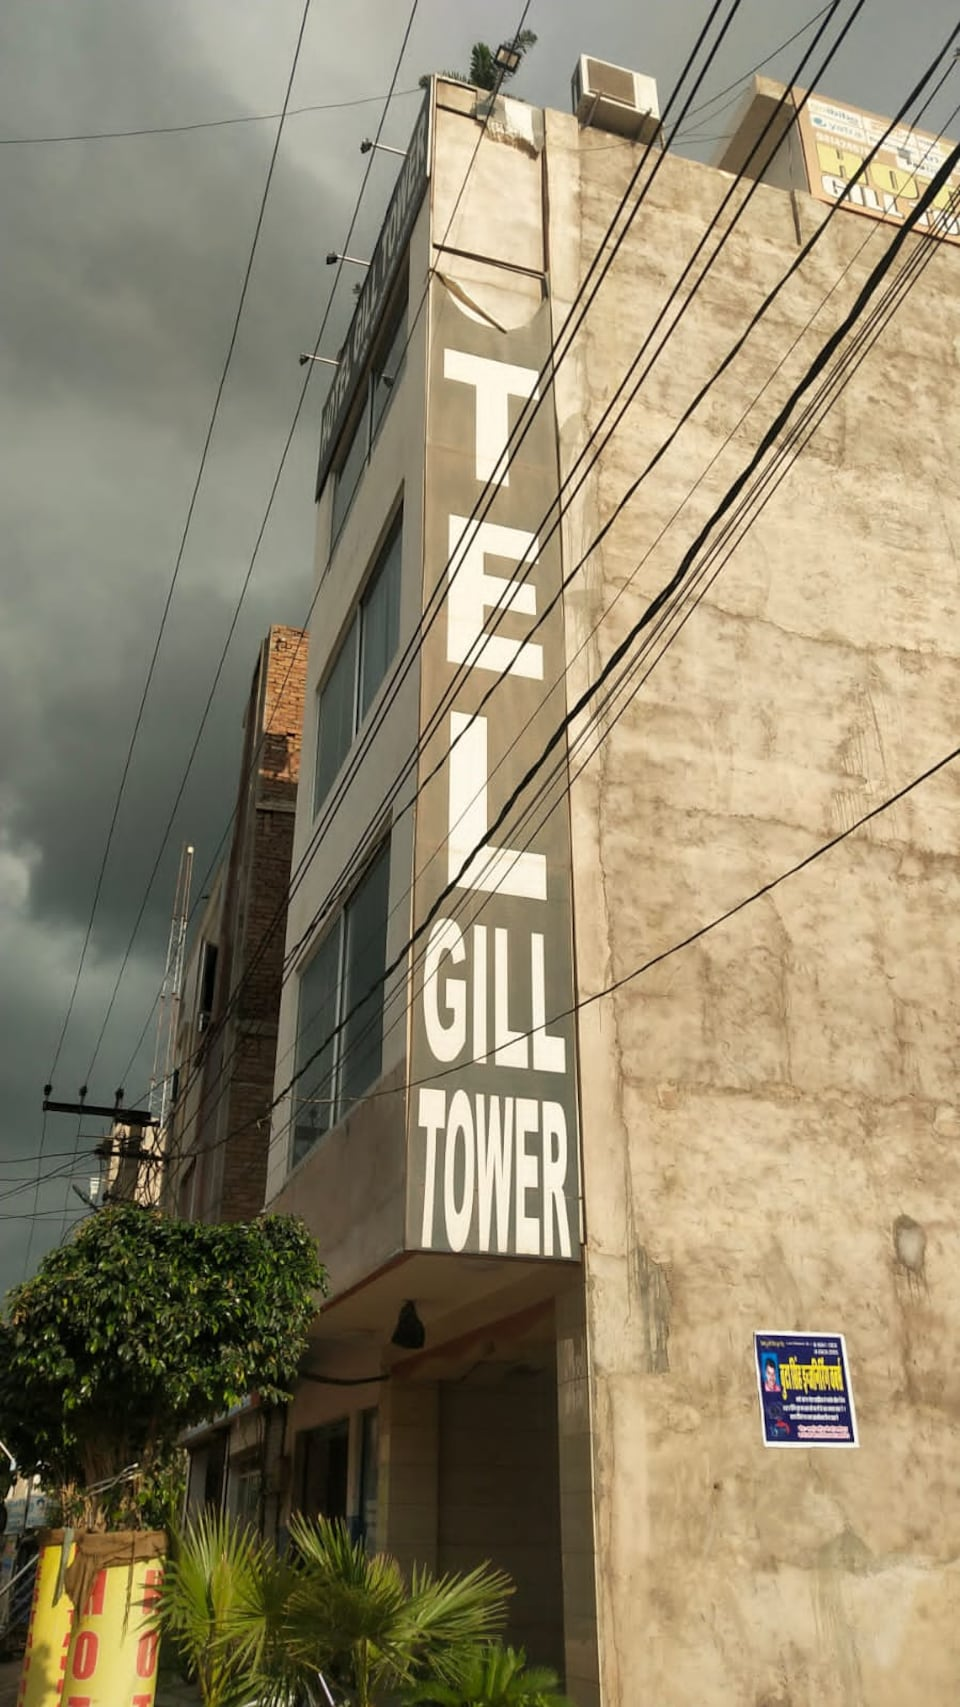 OYO 82928 Hotel Gill Tower, Hanumangarh, Hanumangarh